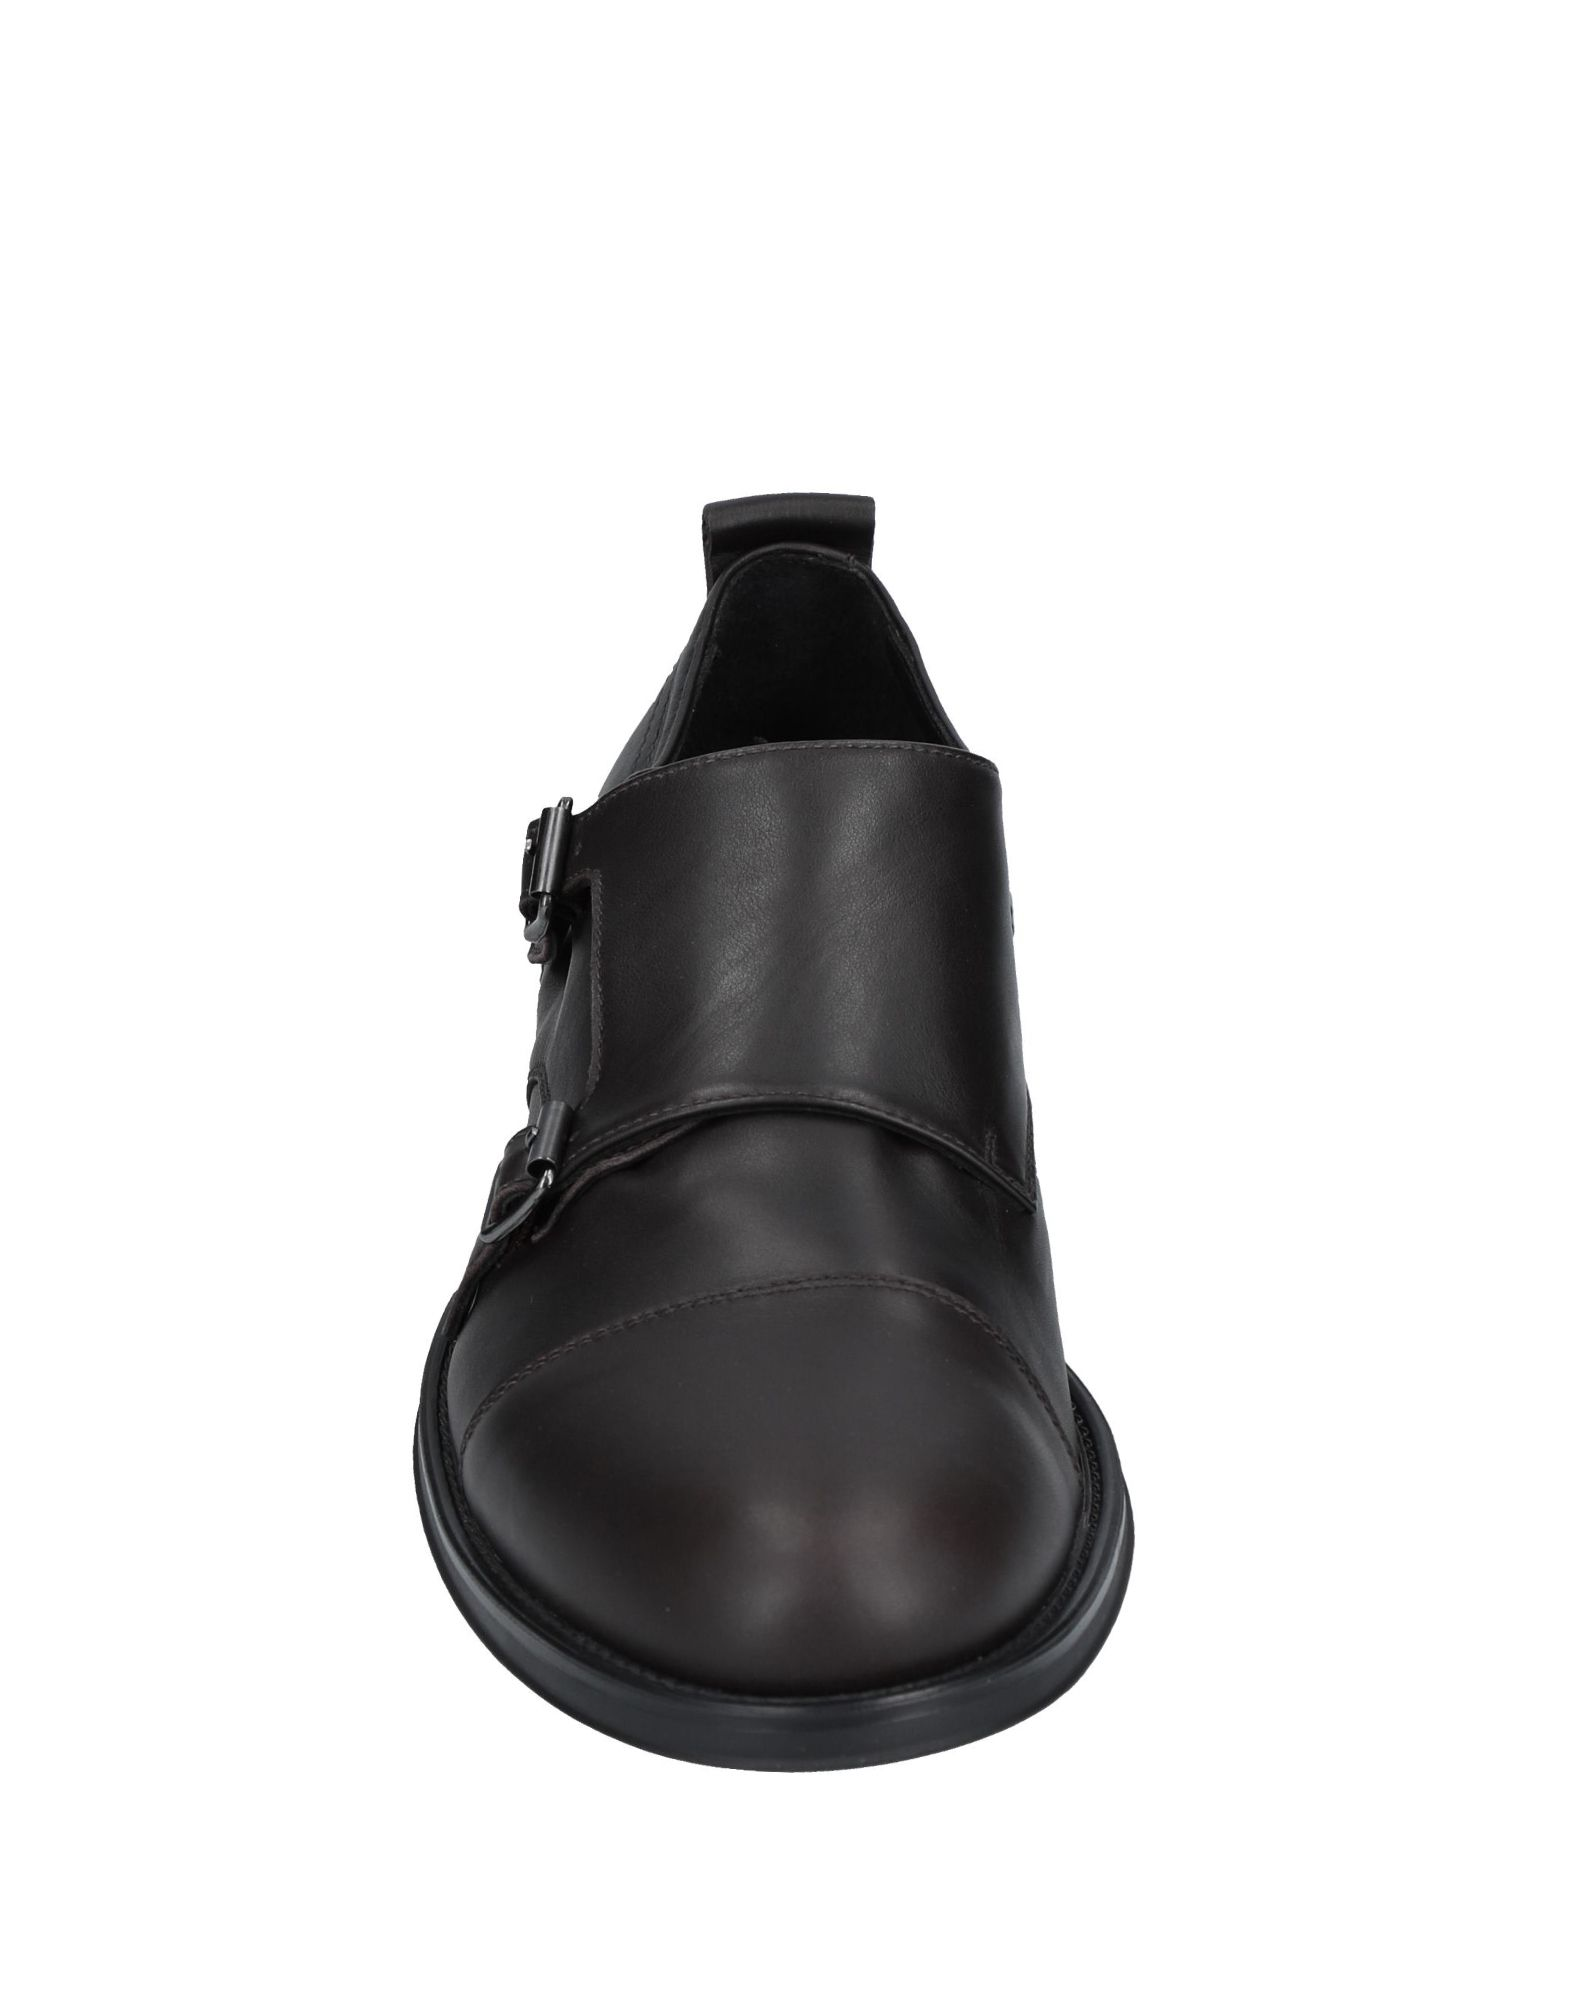 Bruno Bordese Mokassins Herren  Schuhe 11528804QL Gute Qualität beliebte Schuhe  88f151